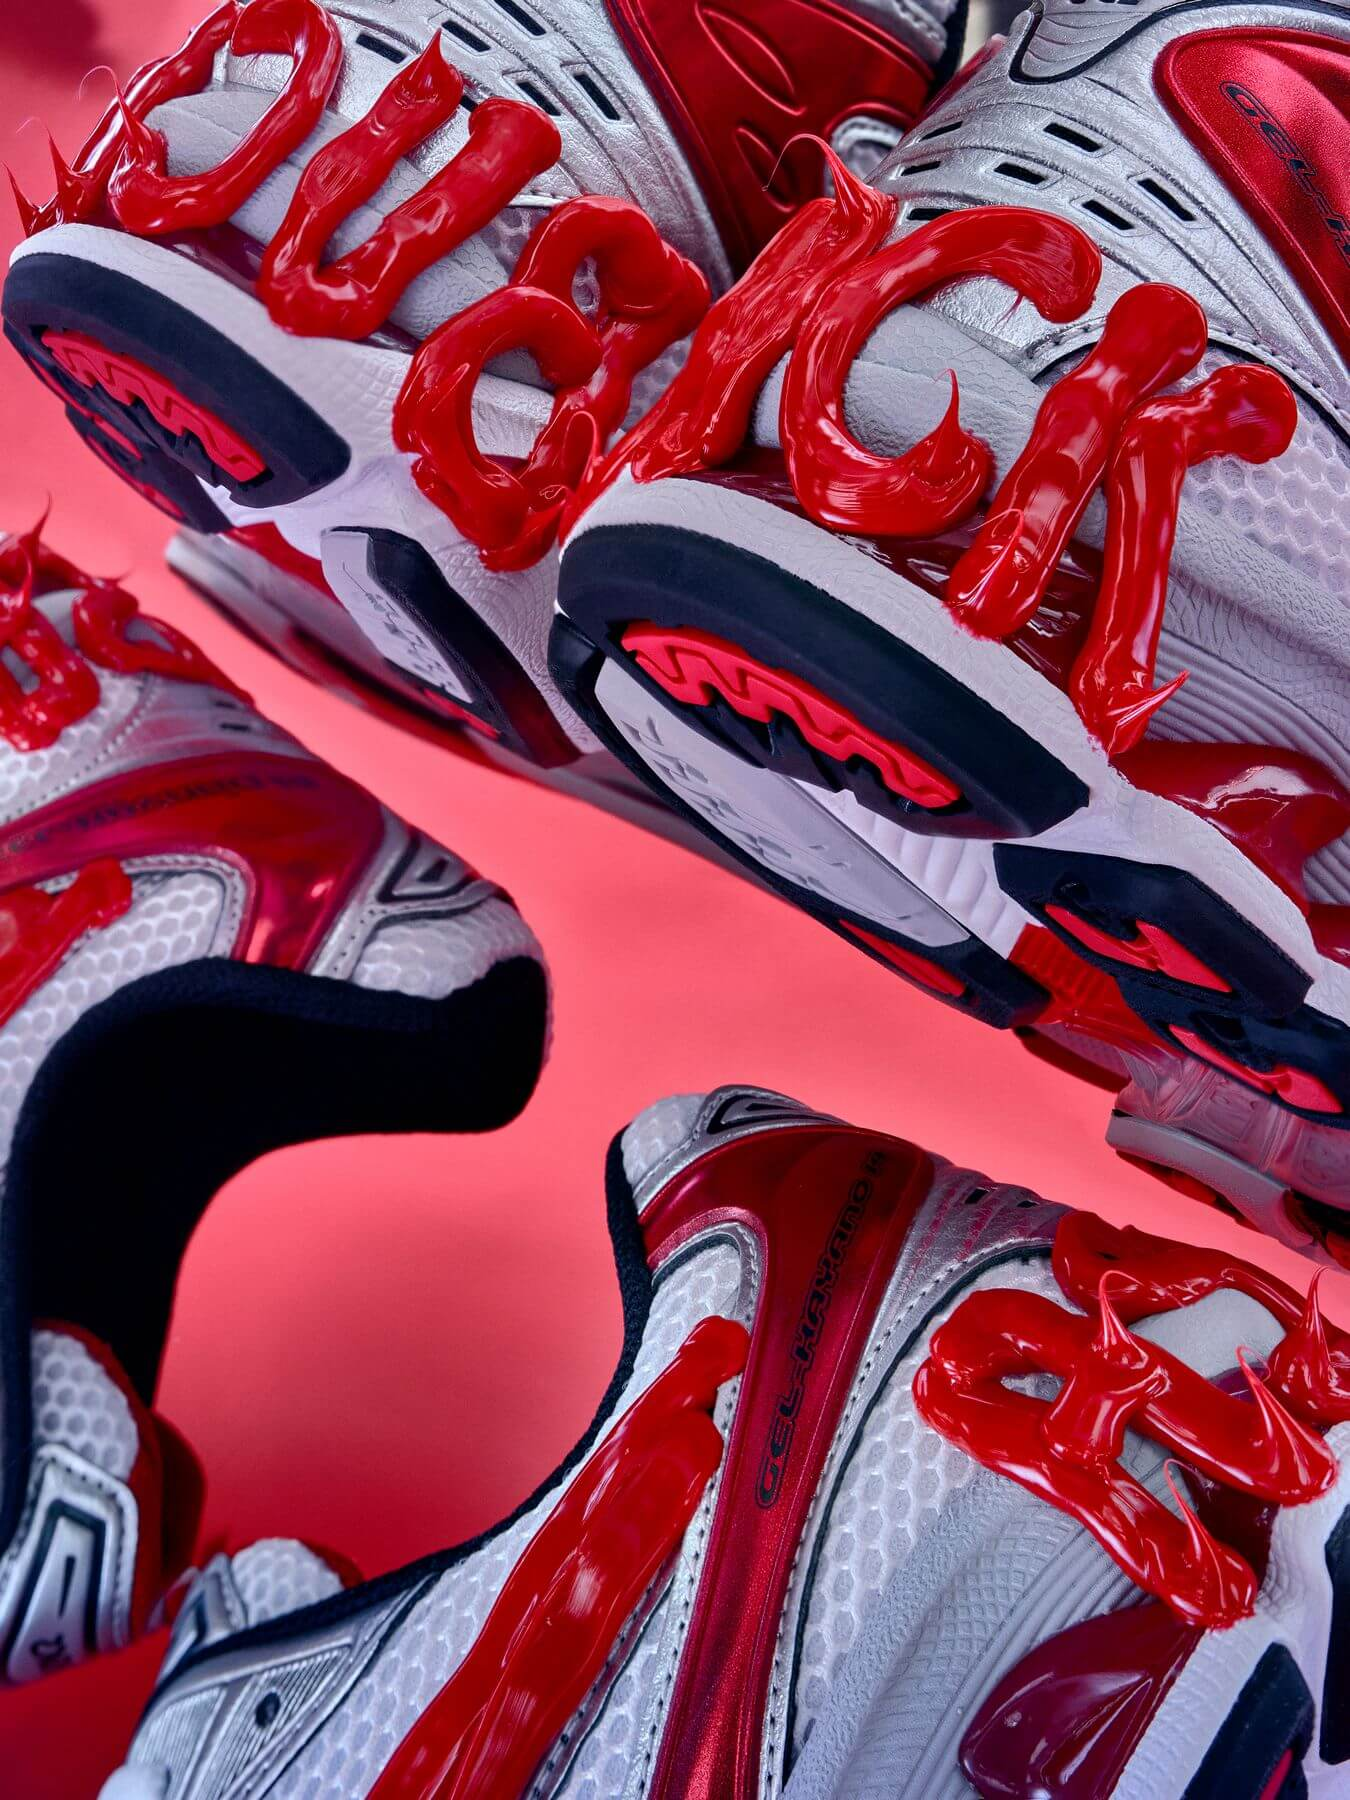 heel details - ASICSx Dennis Buck - Gel Kayano 14